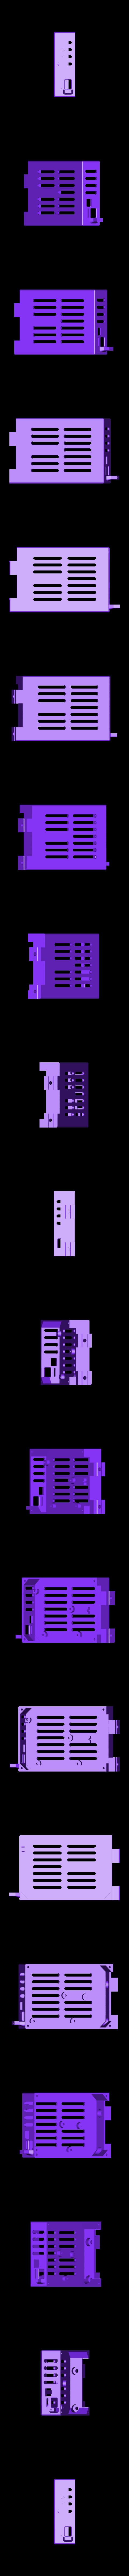 caixa_board_2.stl Download free STL file CR-10 or Mini to Prusa i3 conversion kit • 3D print design, aerofred